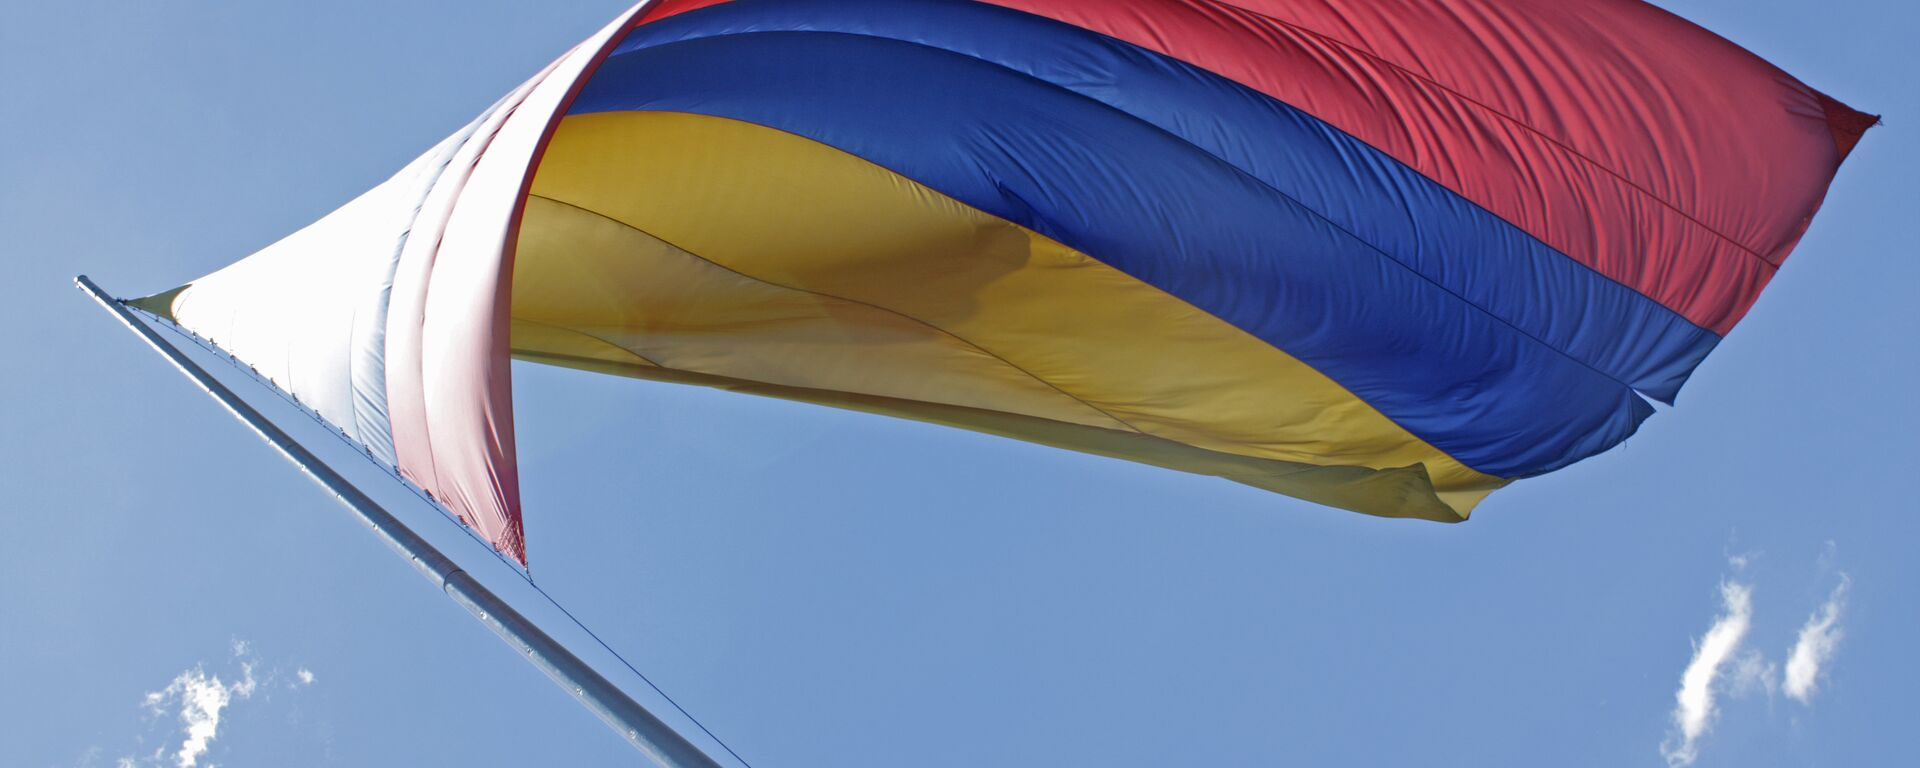 Bandera de Colombia - Sputnik Mundo, 1920, 04.06.2021